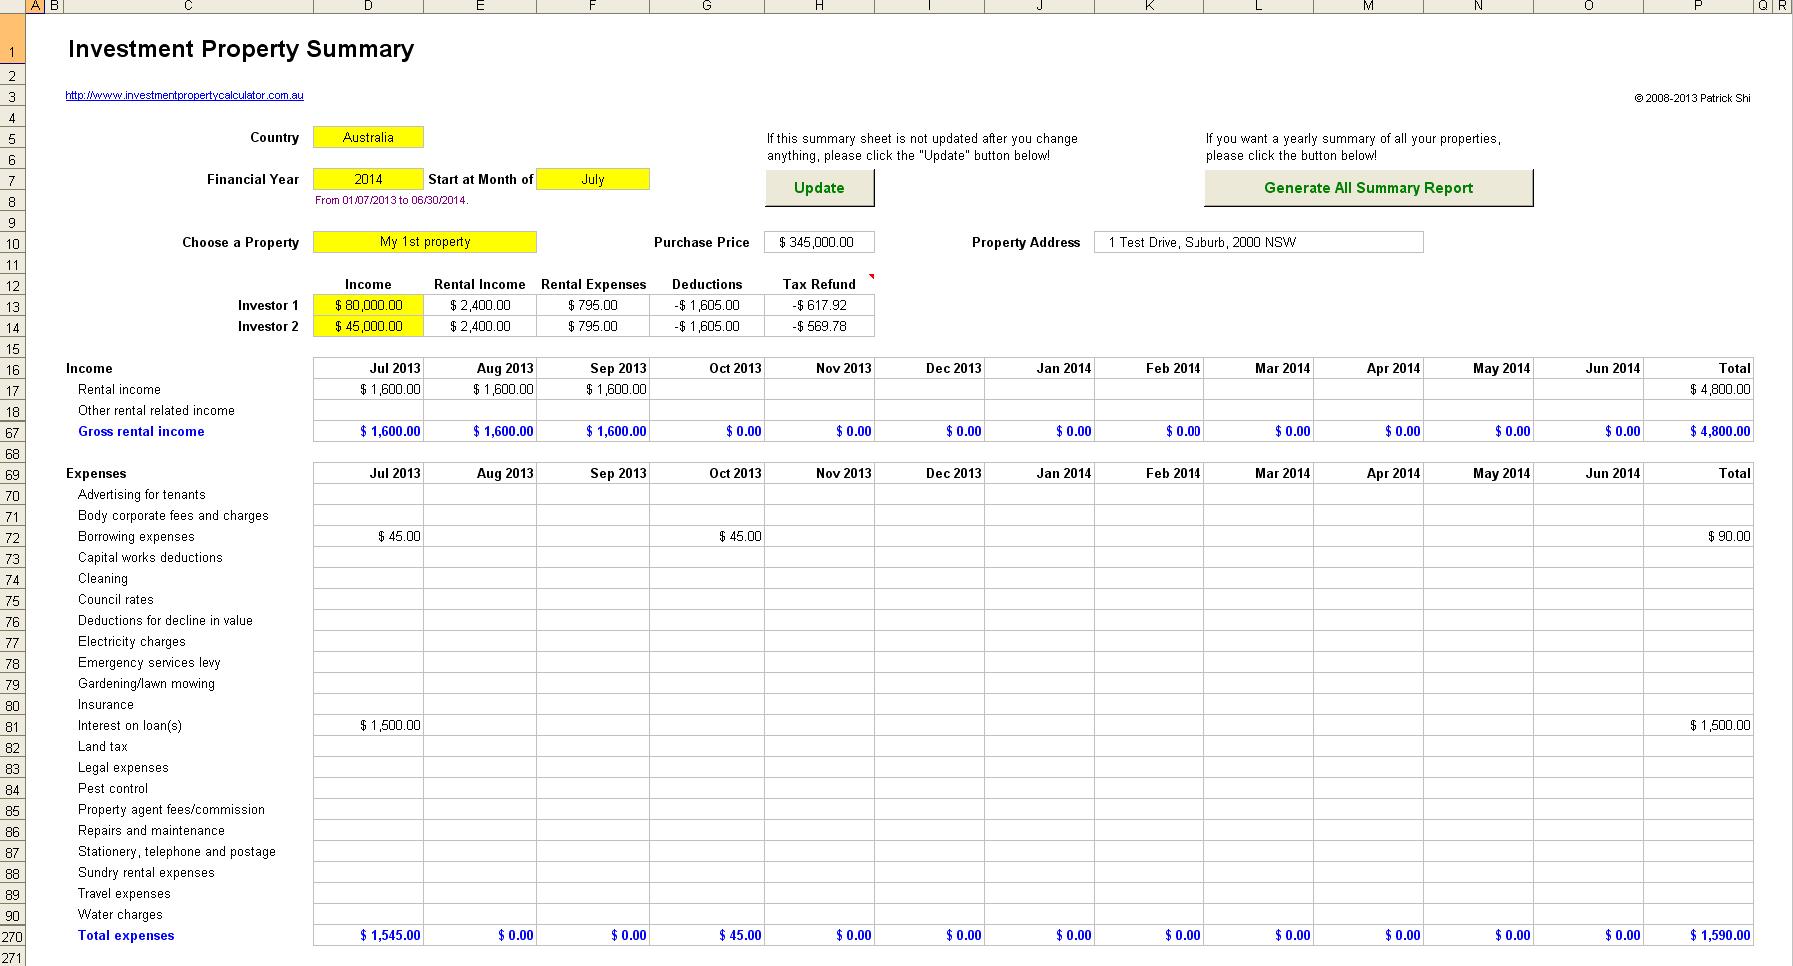 Sole Trader Bookkeeping Spreadsheet Australia